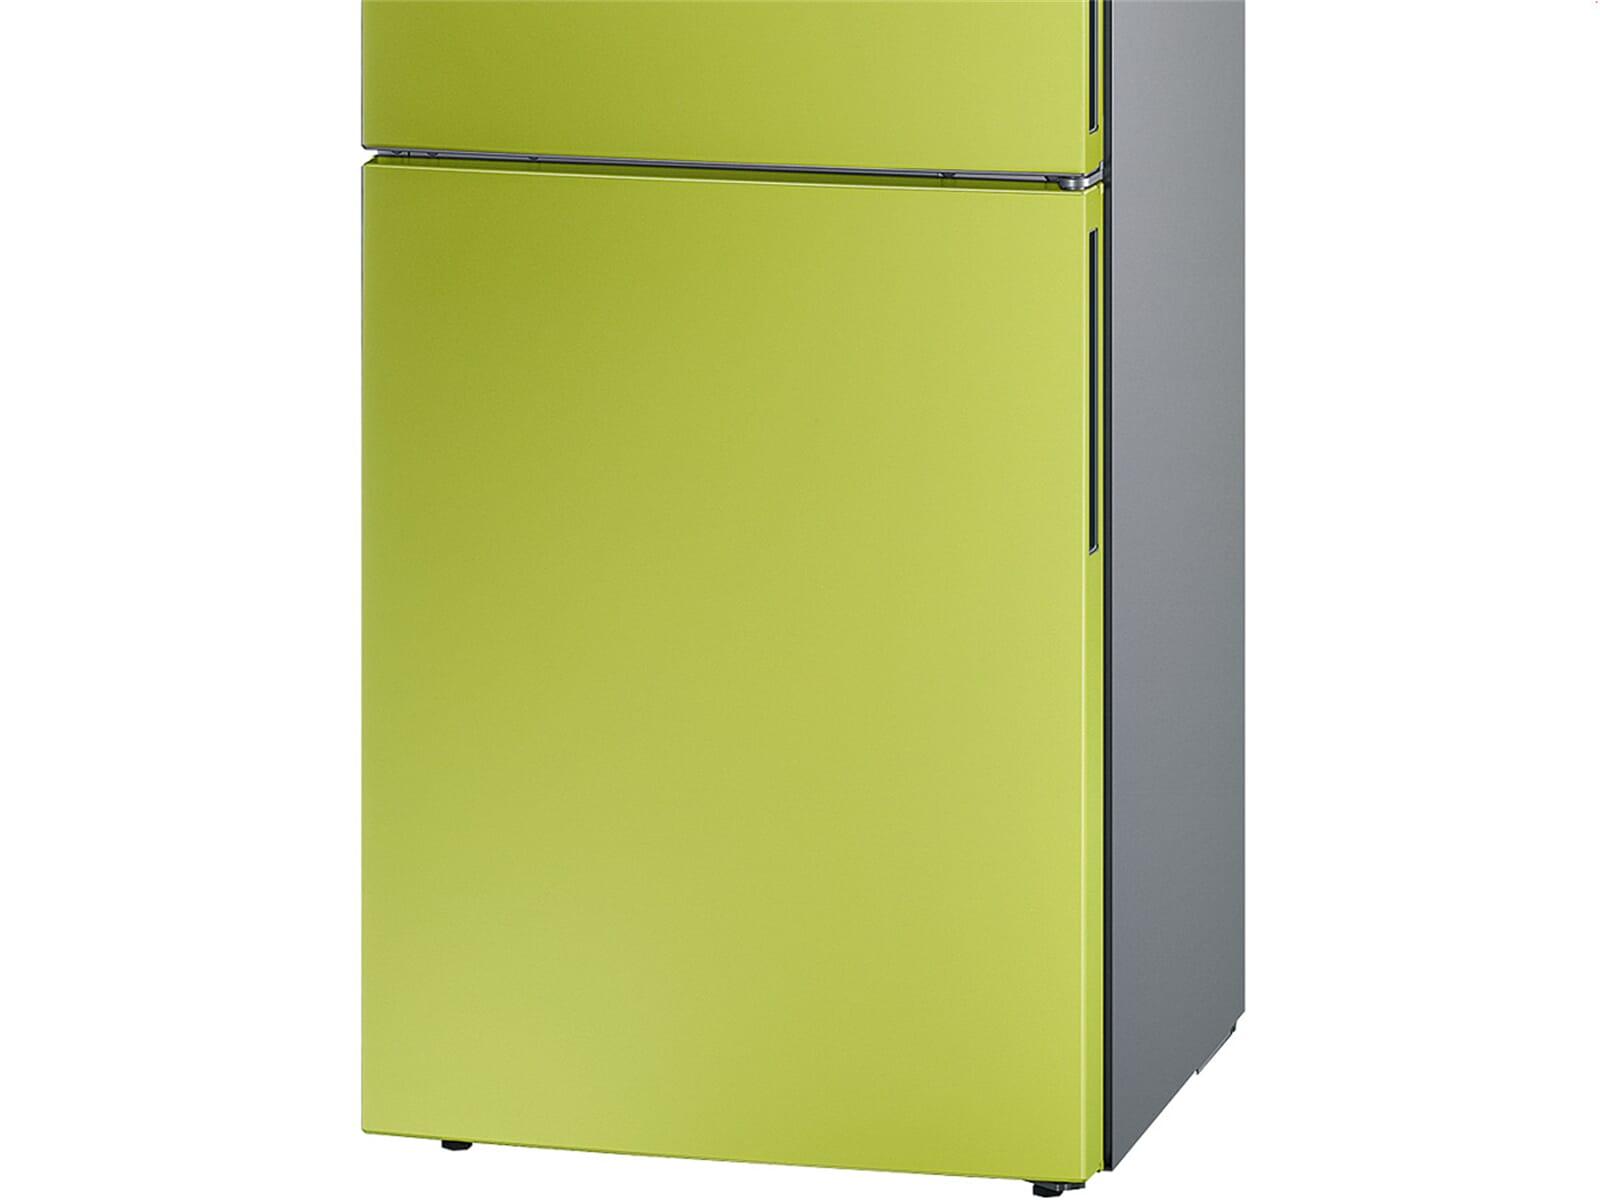 Bosch Kühlschrank Biofresh : Bosch kgv vh s kühl gefrierkombination lime green